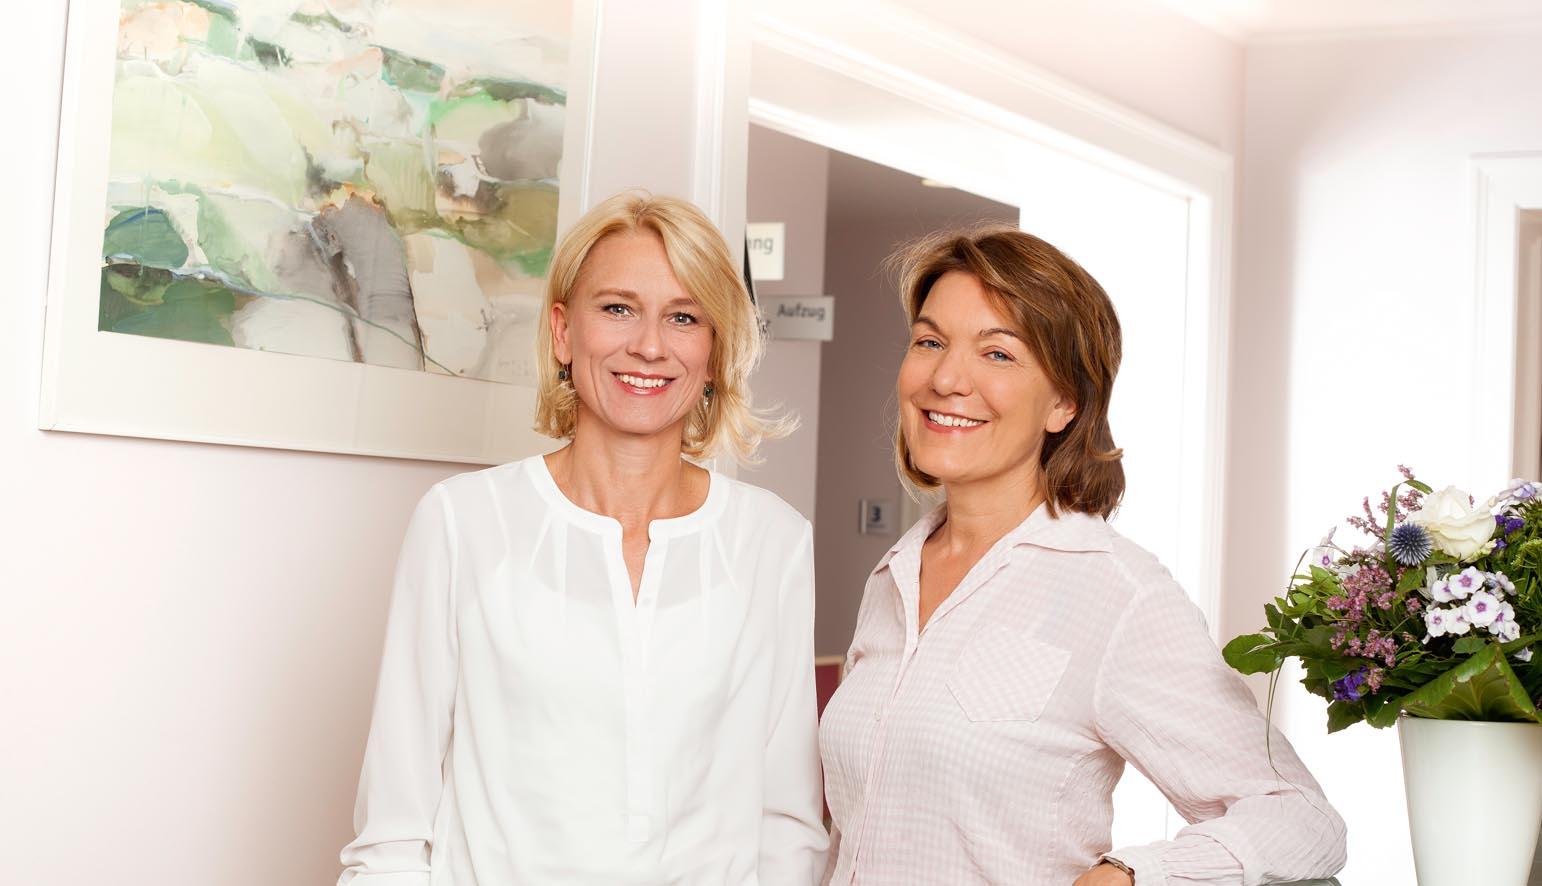 Edith Öhrig-Pohl und Meike Stübs